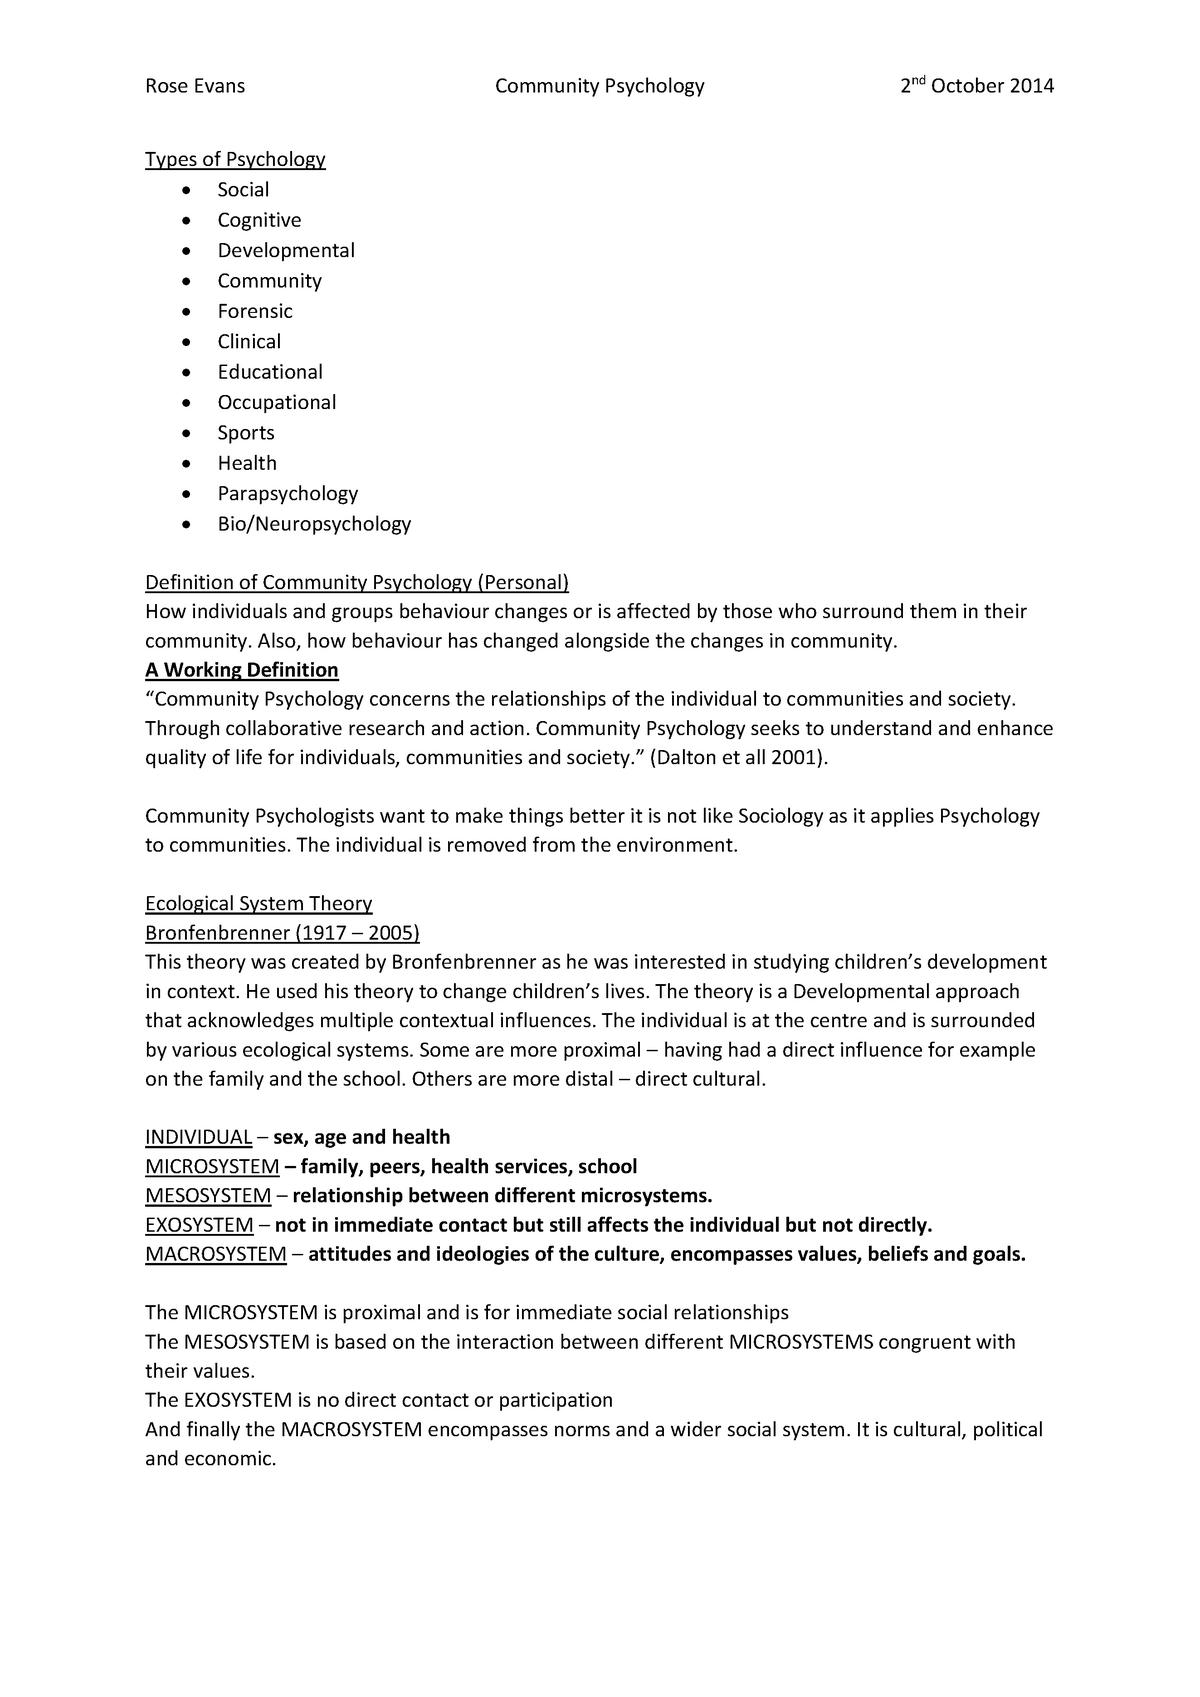 Lecture notes, lectures 1-2,6-8 - Community psychology - StuDocu